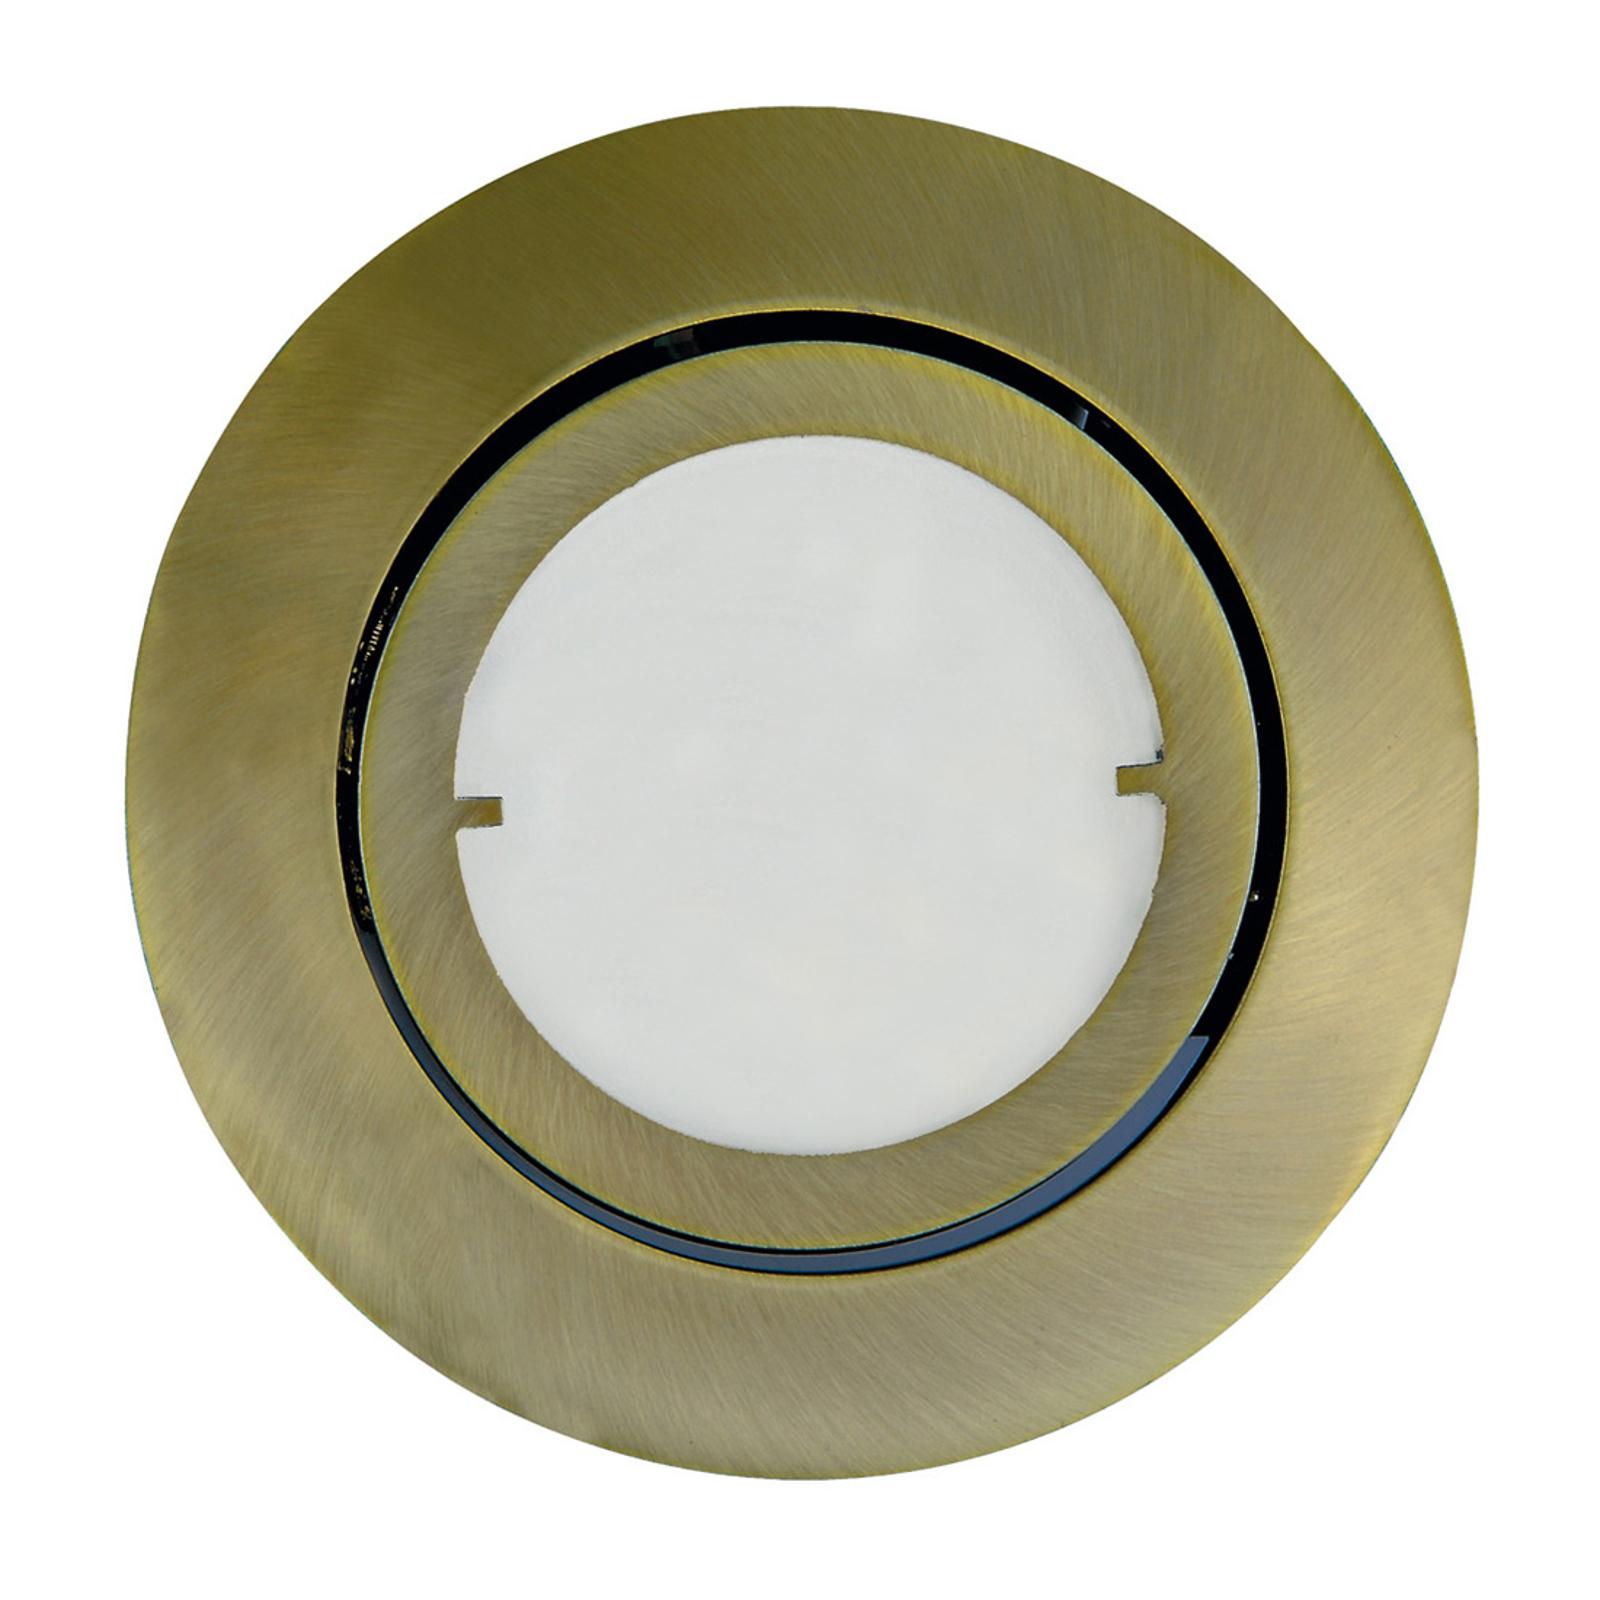 Joanie - LED-inbyggnadslampa, i gammal mässing